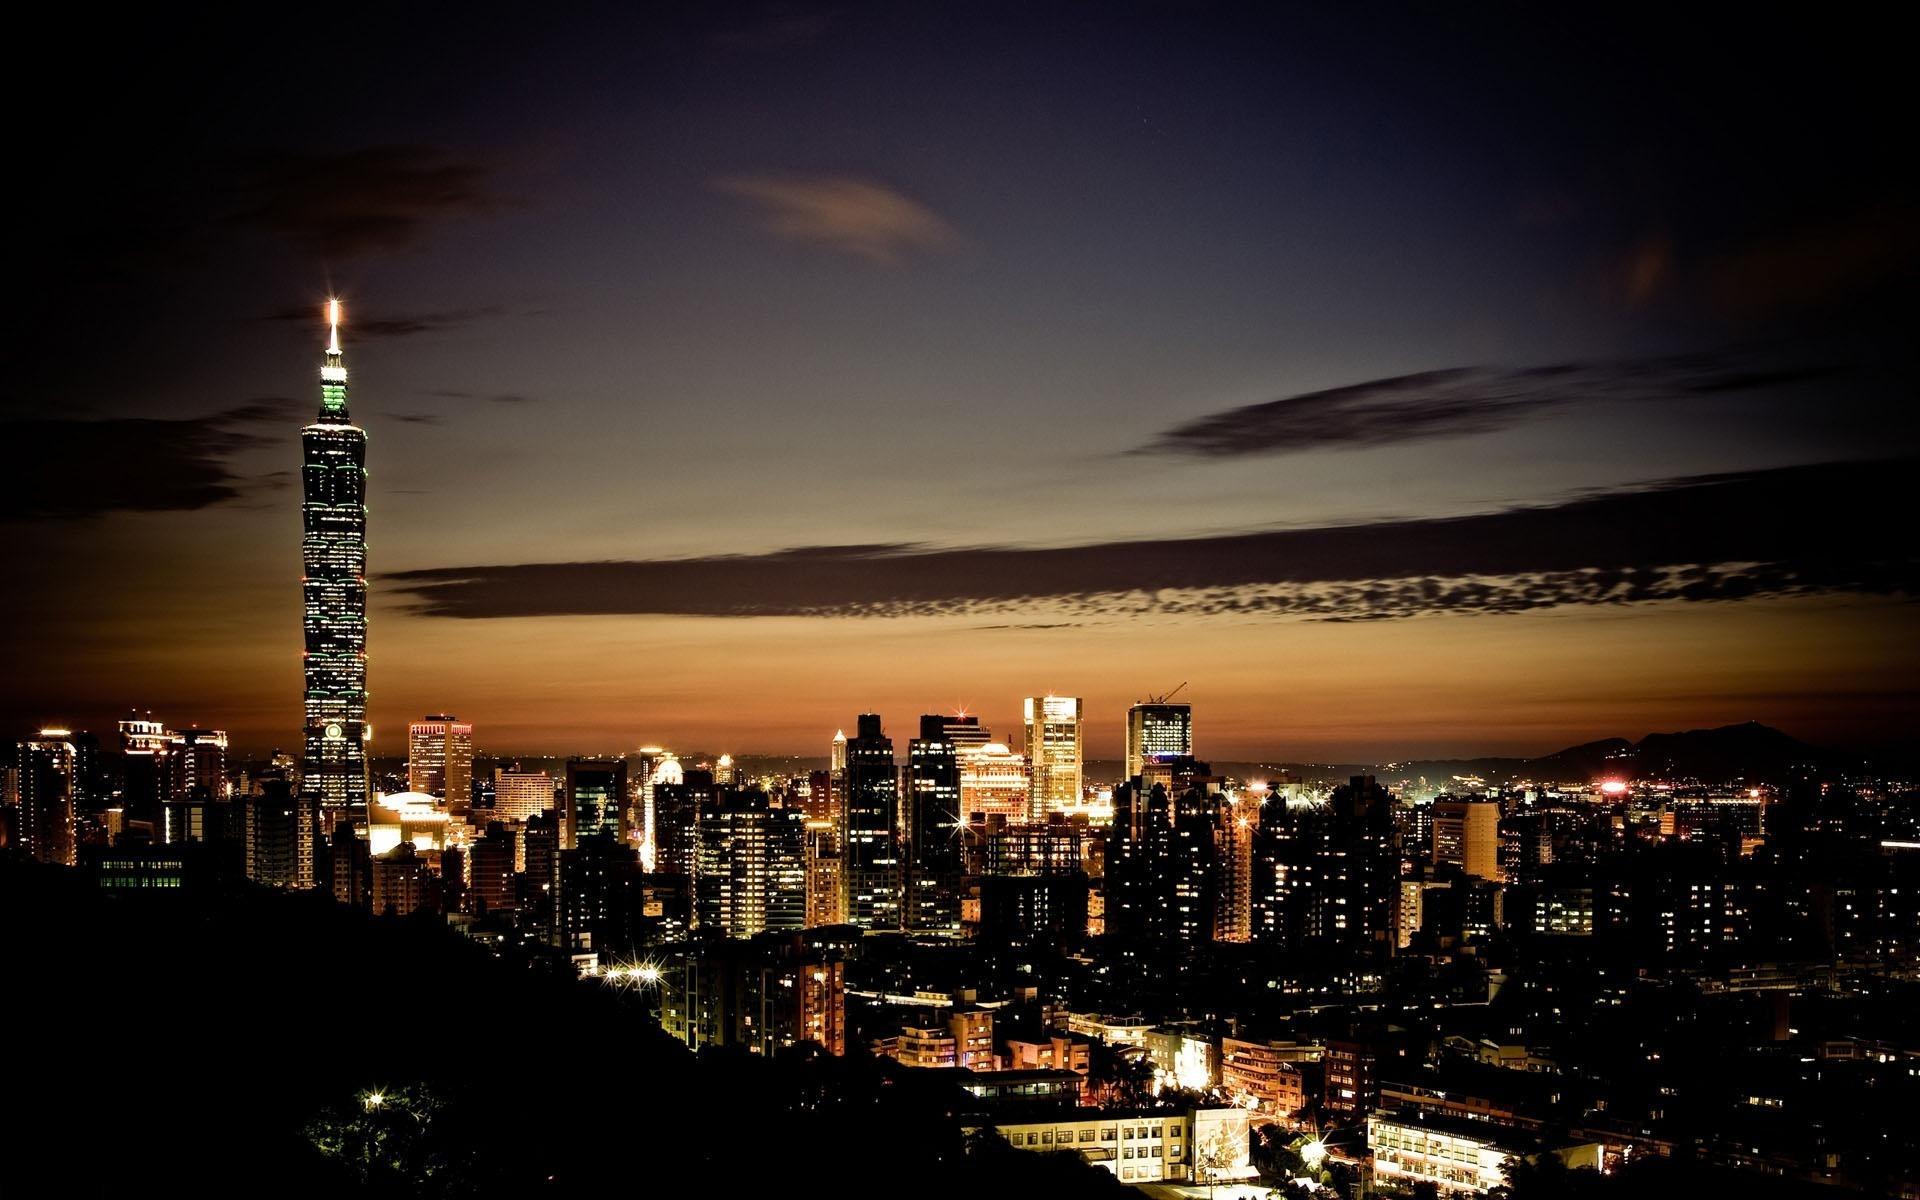 beautiful-city-night-germany-landscape-new-hd-wallpaper-